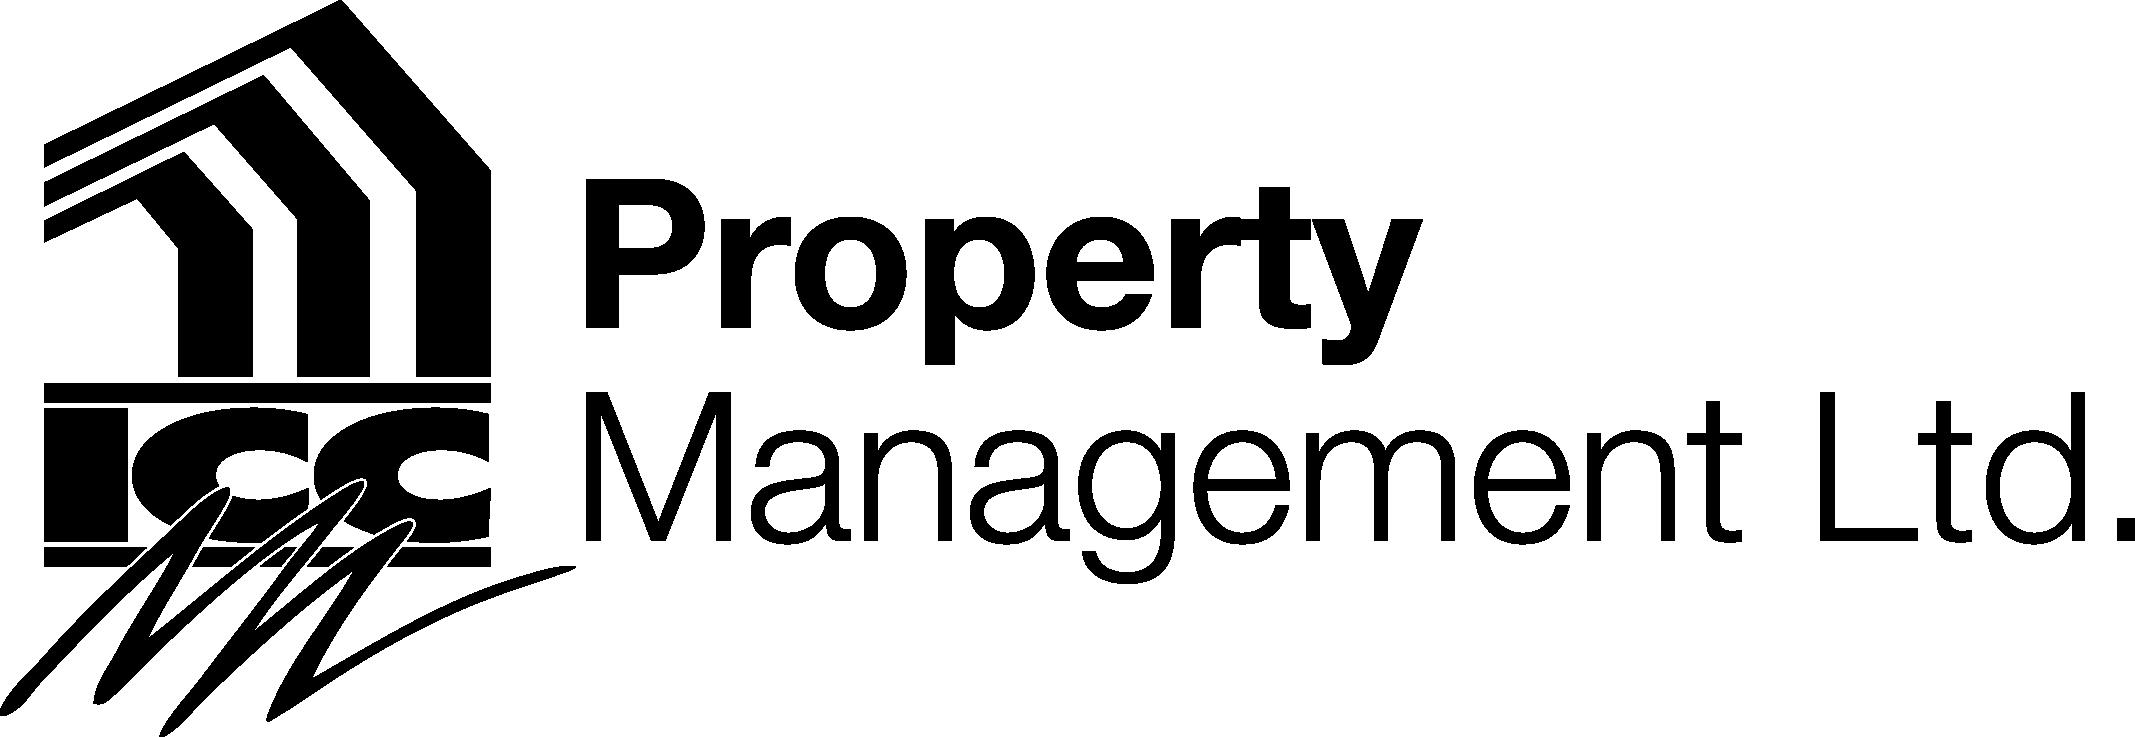 ICC Property Management